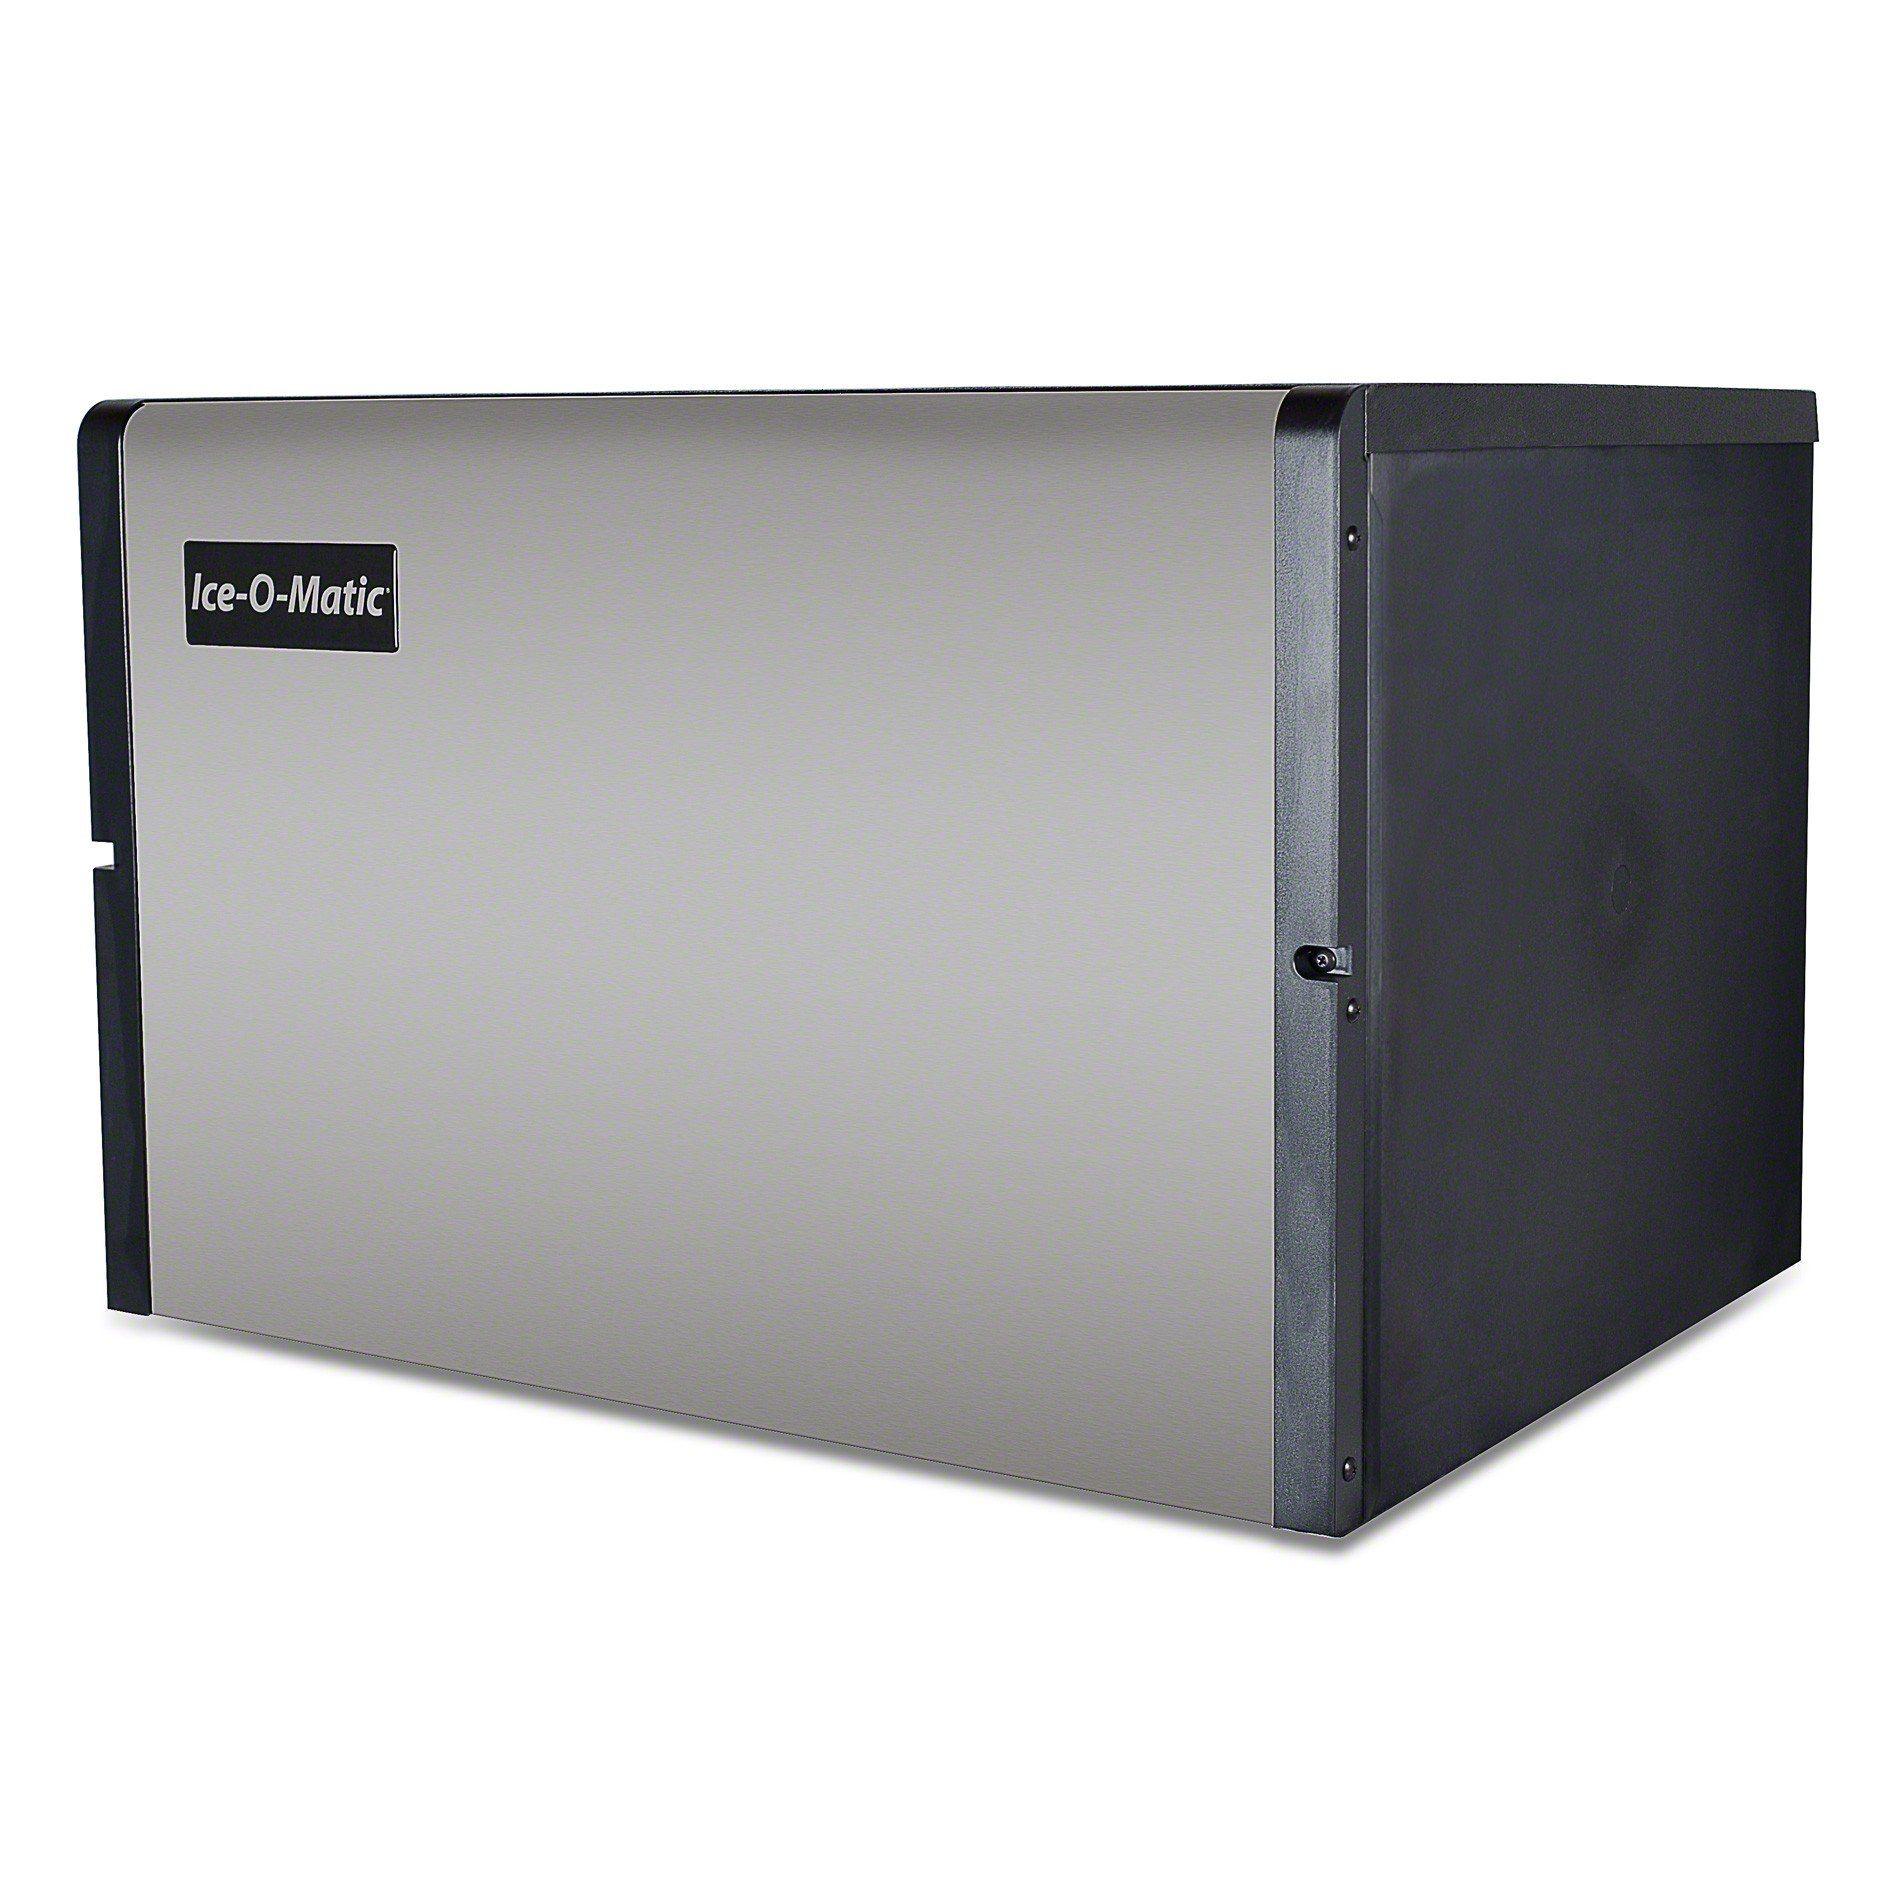 Iceomatic Ice1007hr Remote Air Cooled 910 Lb Half Cube Ice Machine